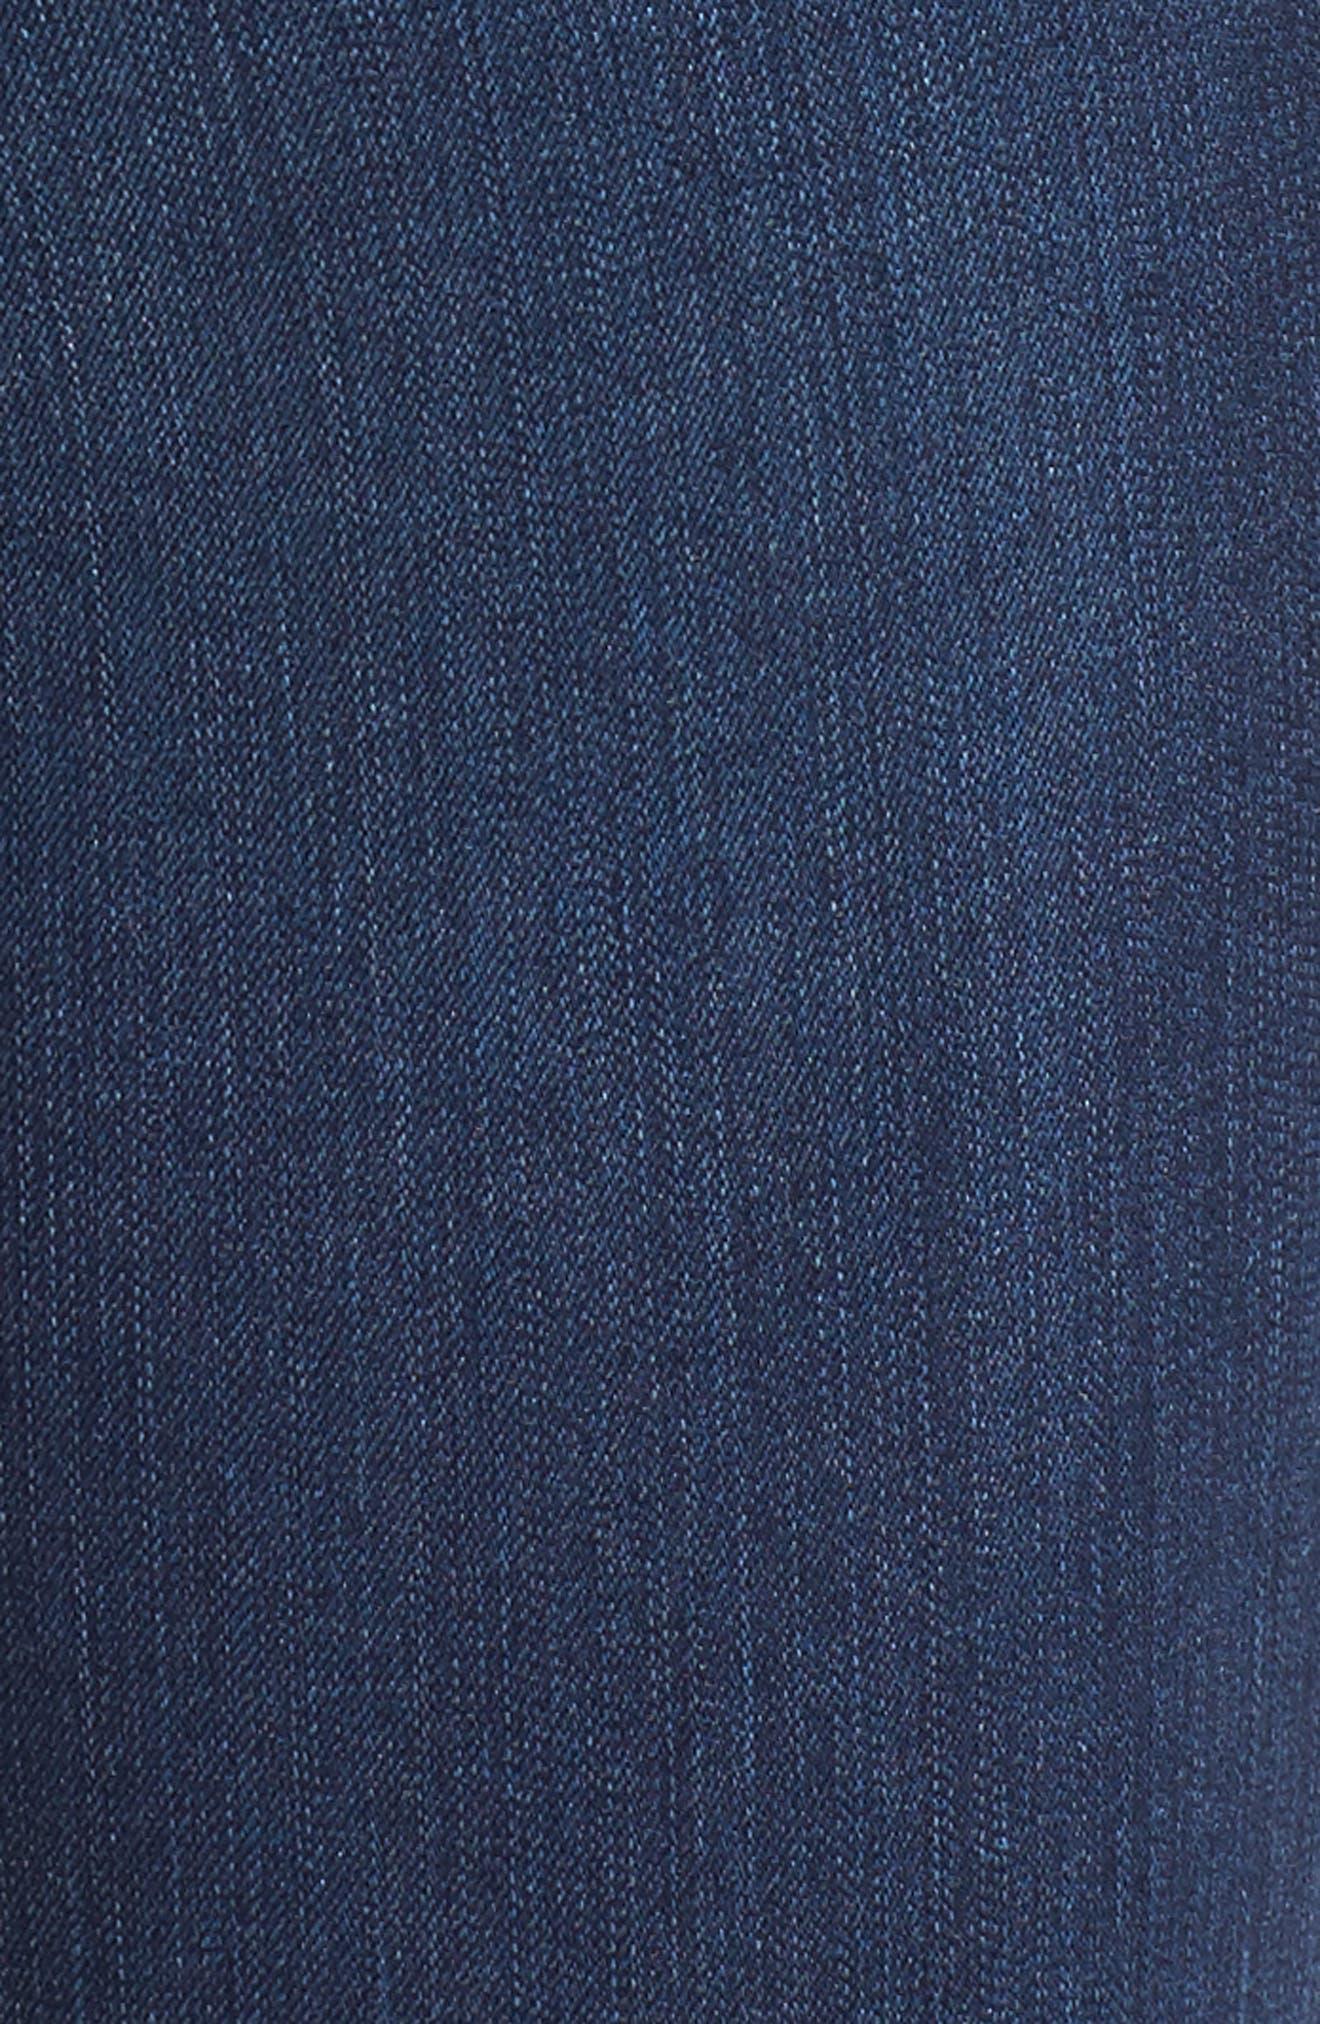 Roadtripper Jeans,                             Alternate thumbnail 5, color,                             416